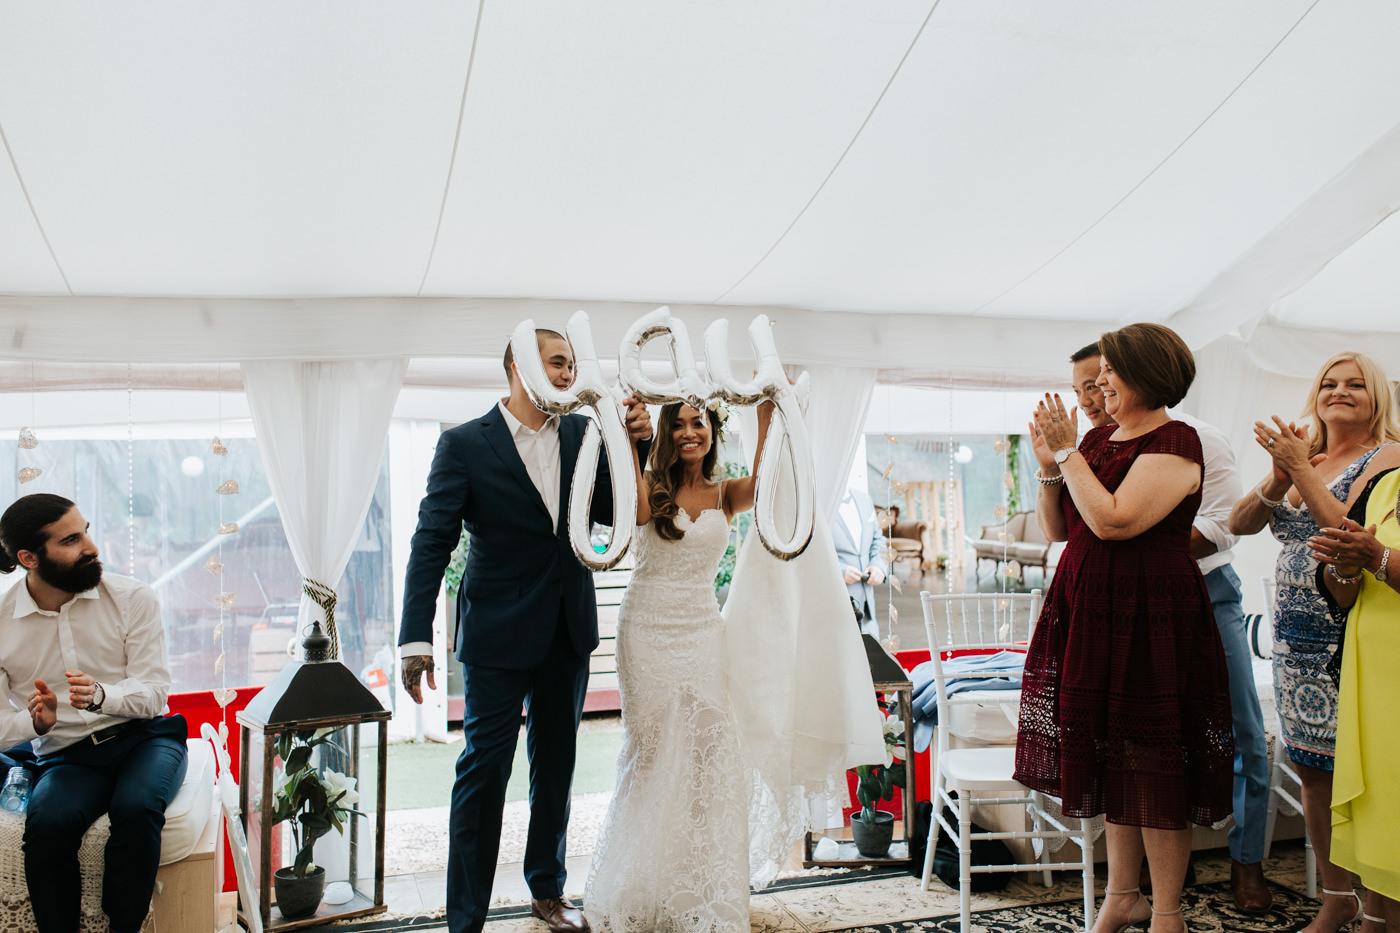 Nick & Vanezza - Fernbank Farm Wedding - Samantha Heather Photography-134.jpg